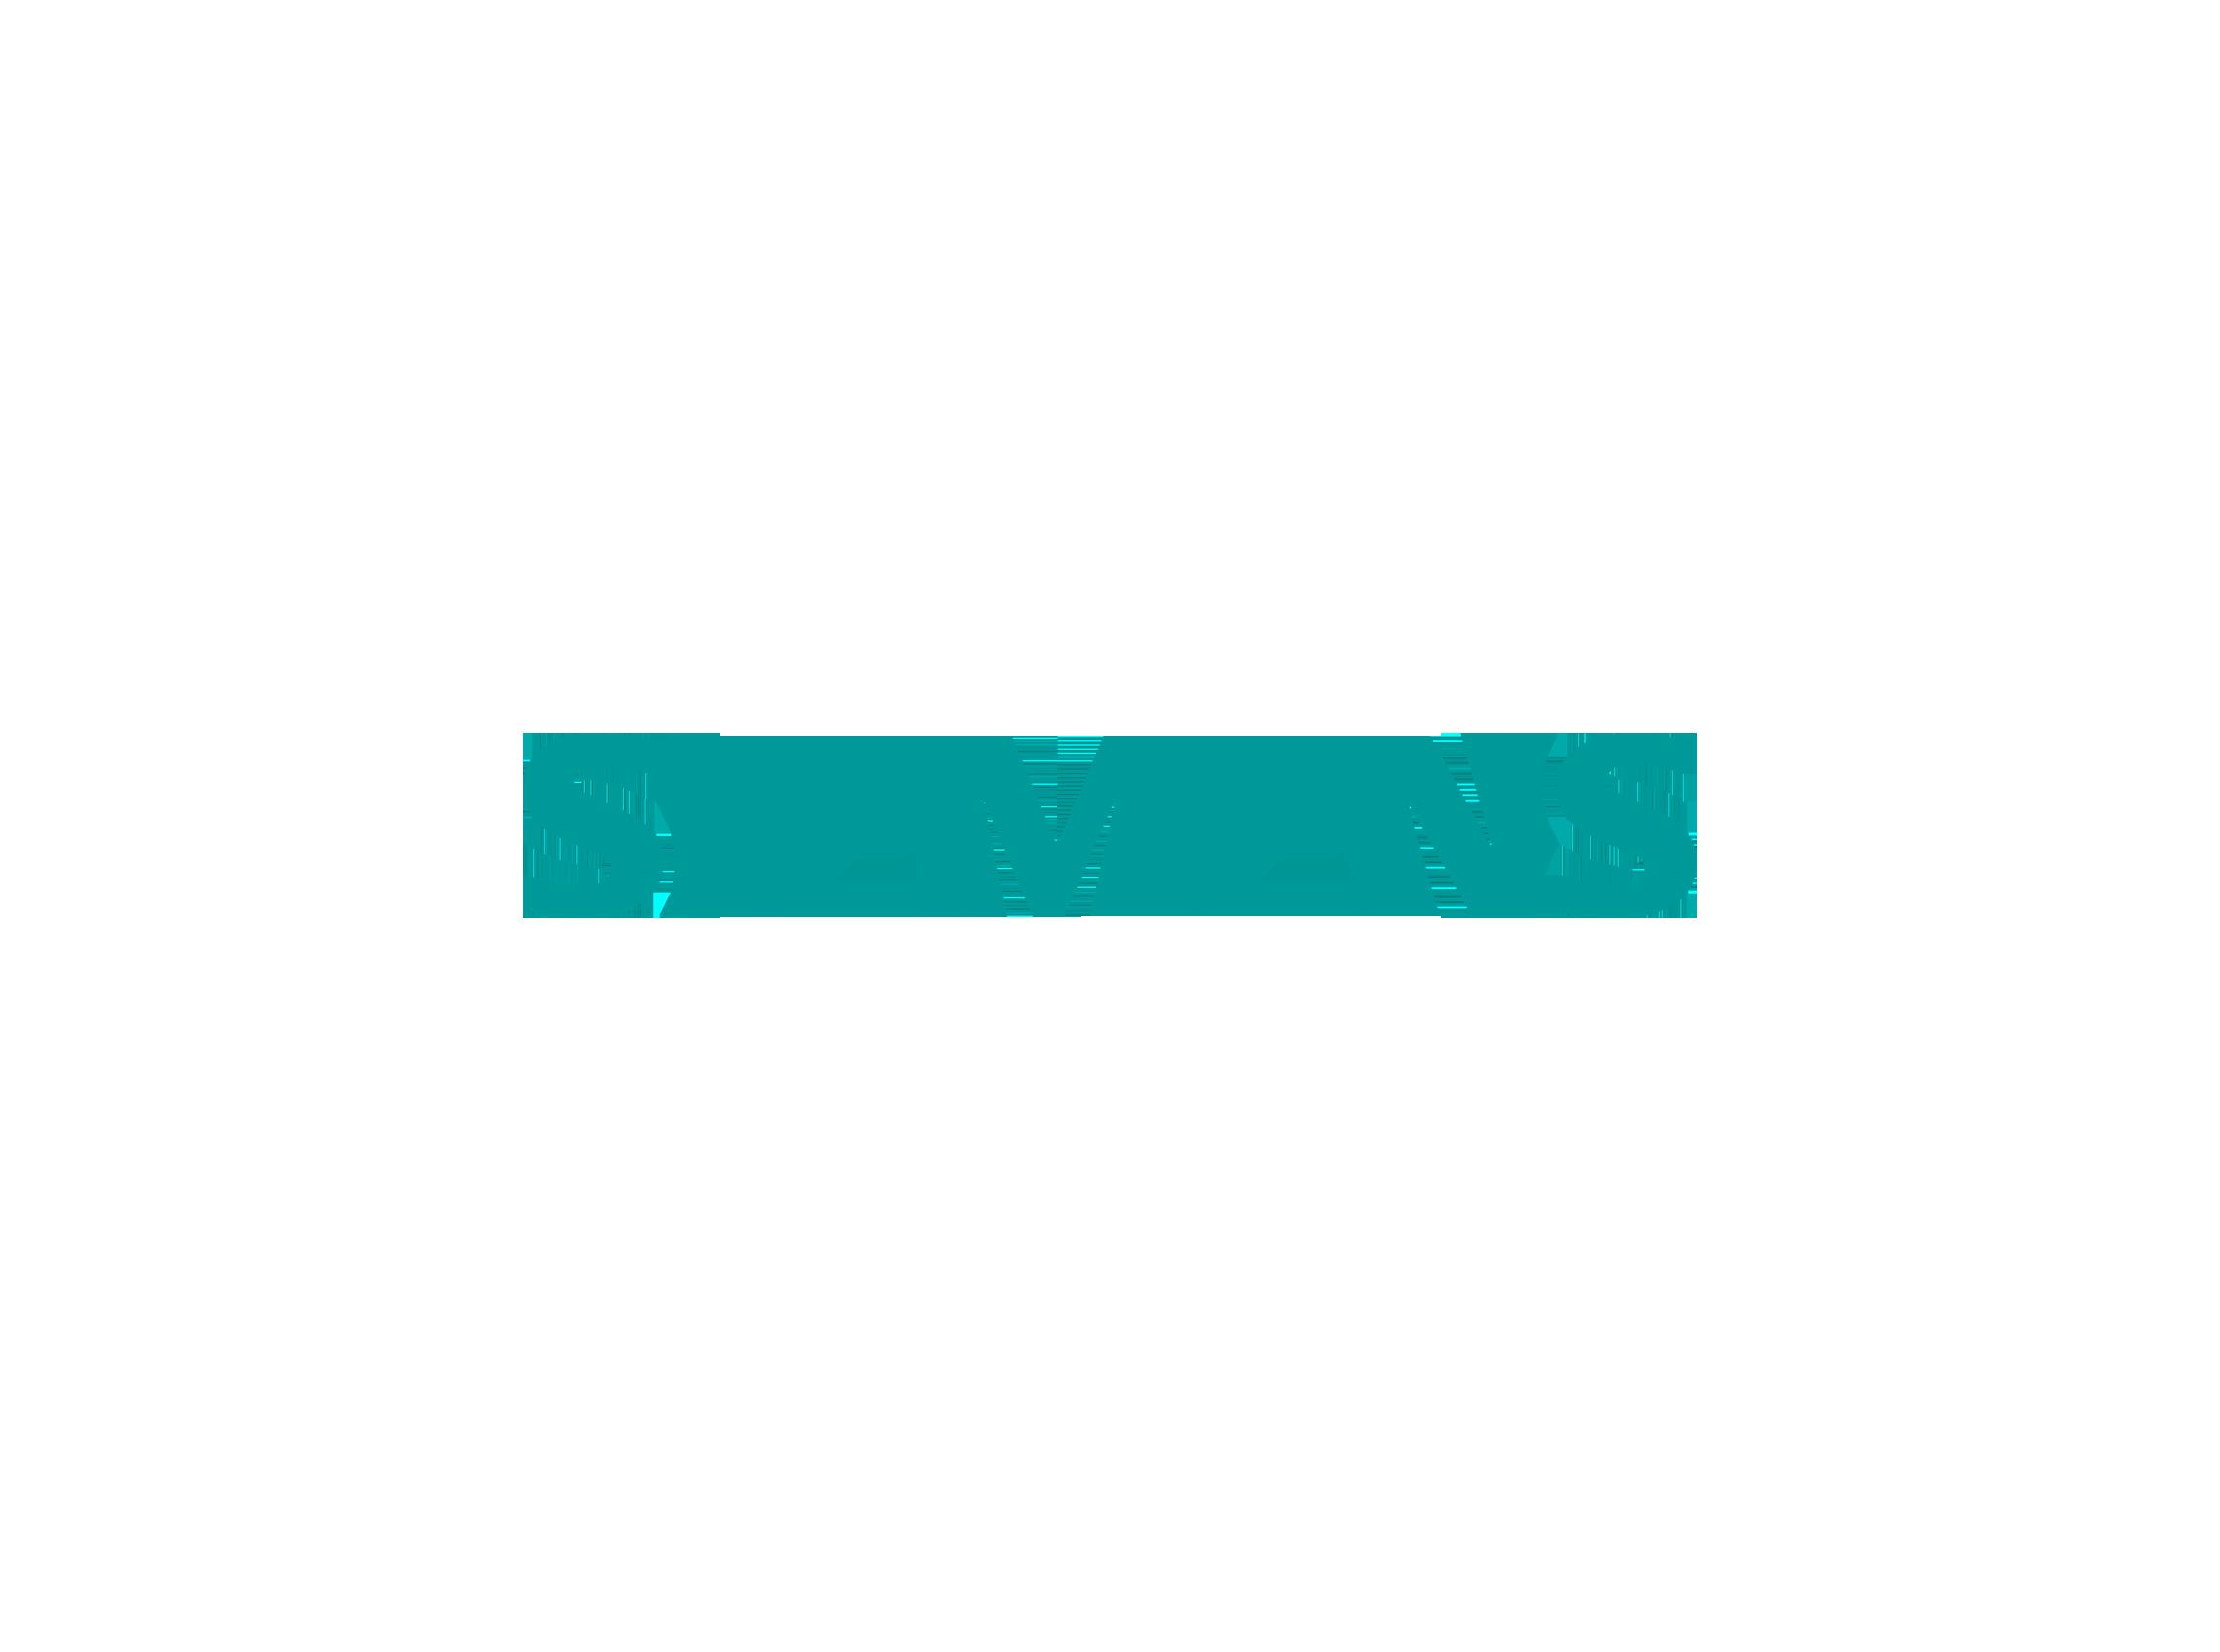 42. Siemens